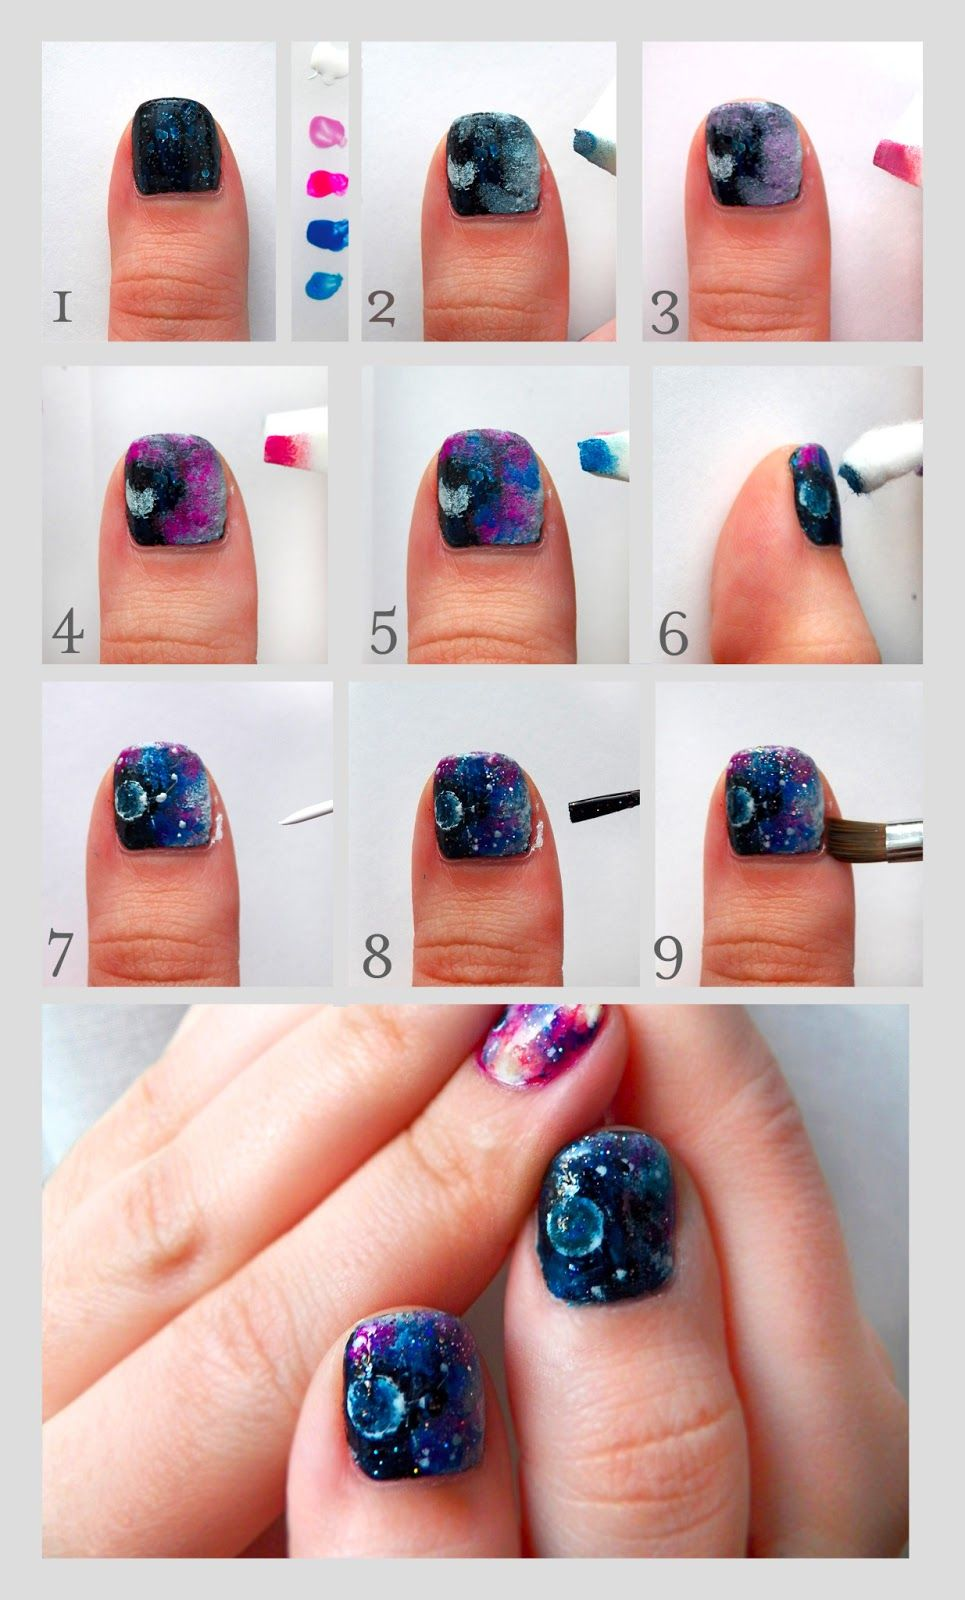 Pretty squared galaxy nails nail art tutorial prettysquared pretty squared galaxy nails nail art tutorial prettysquaredspot nail naildiy prinsesfo Gallery